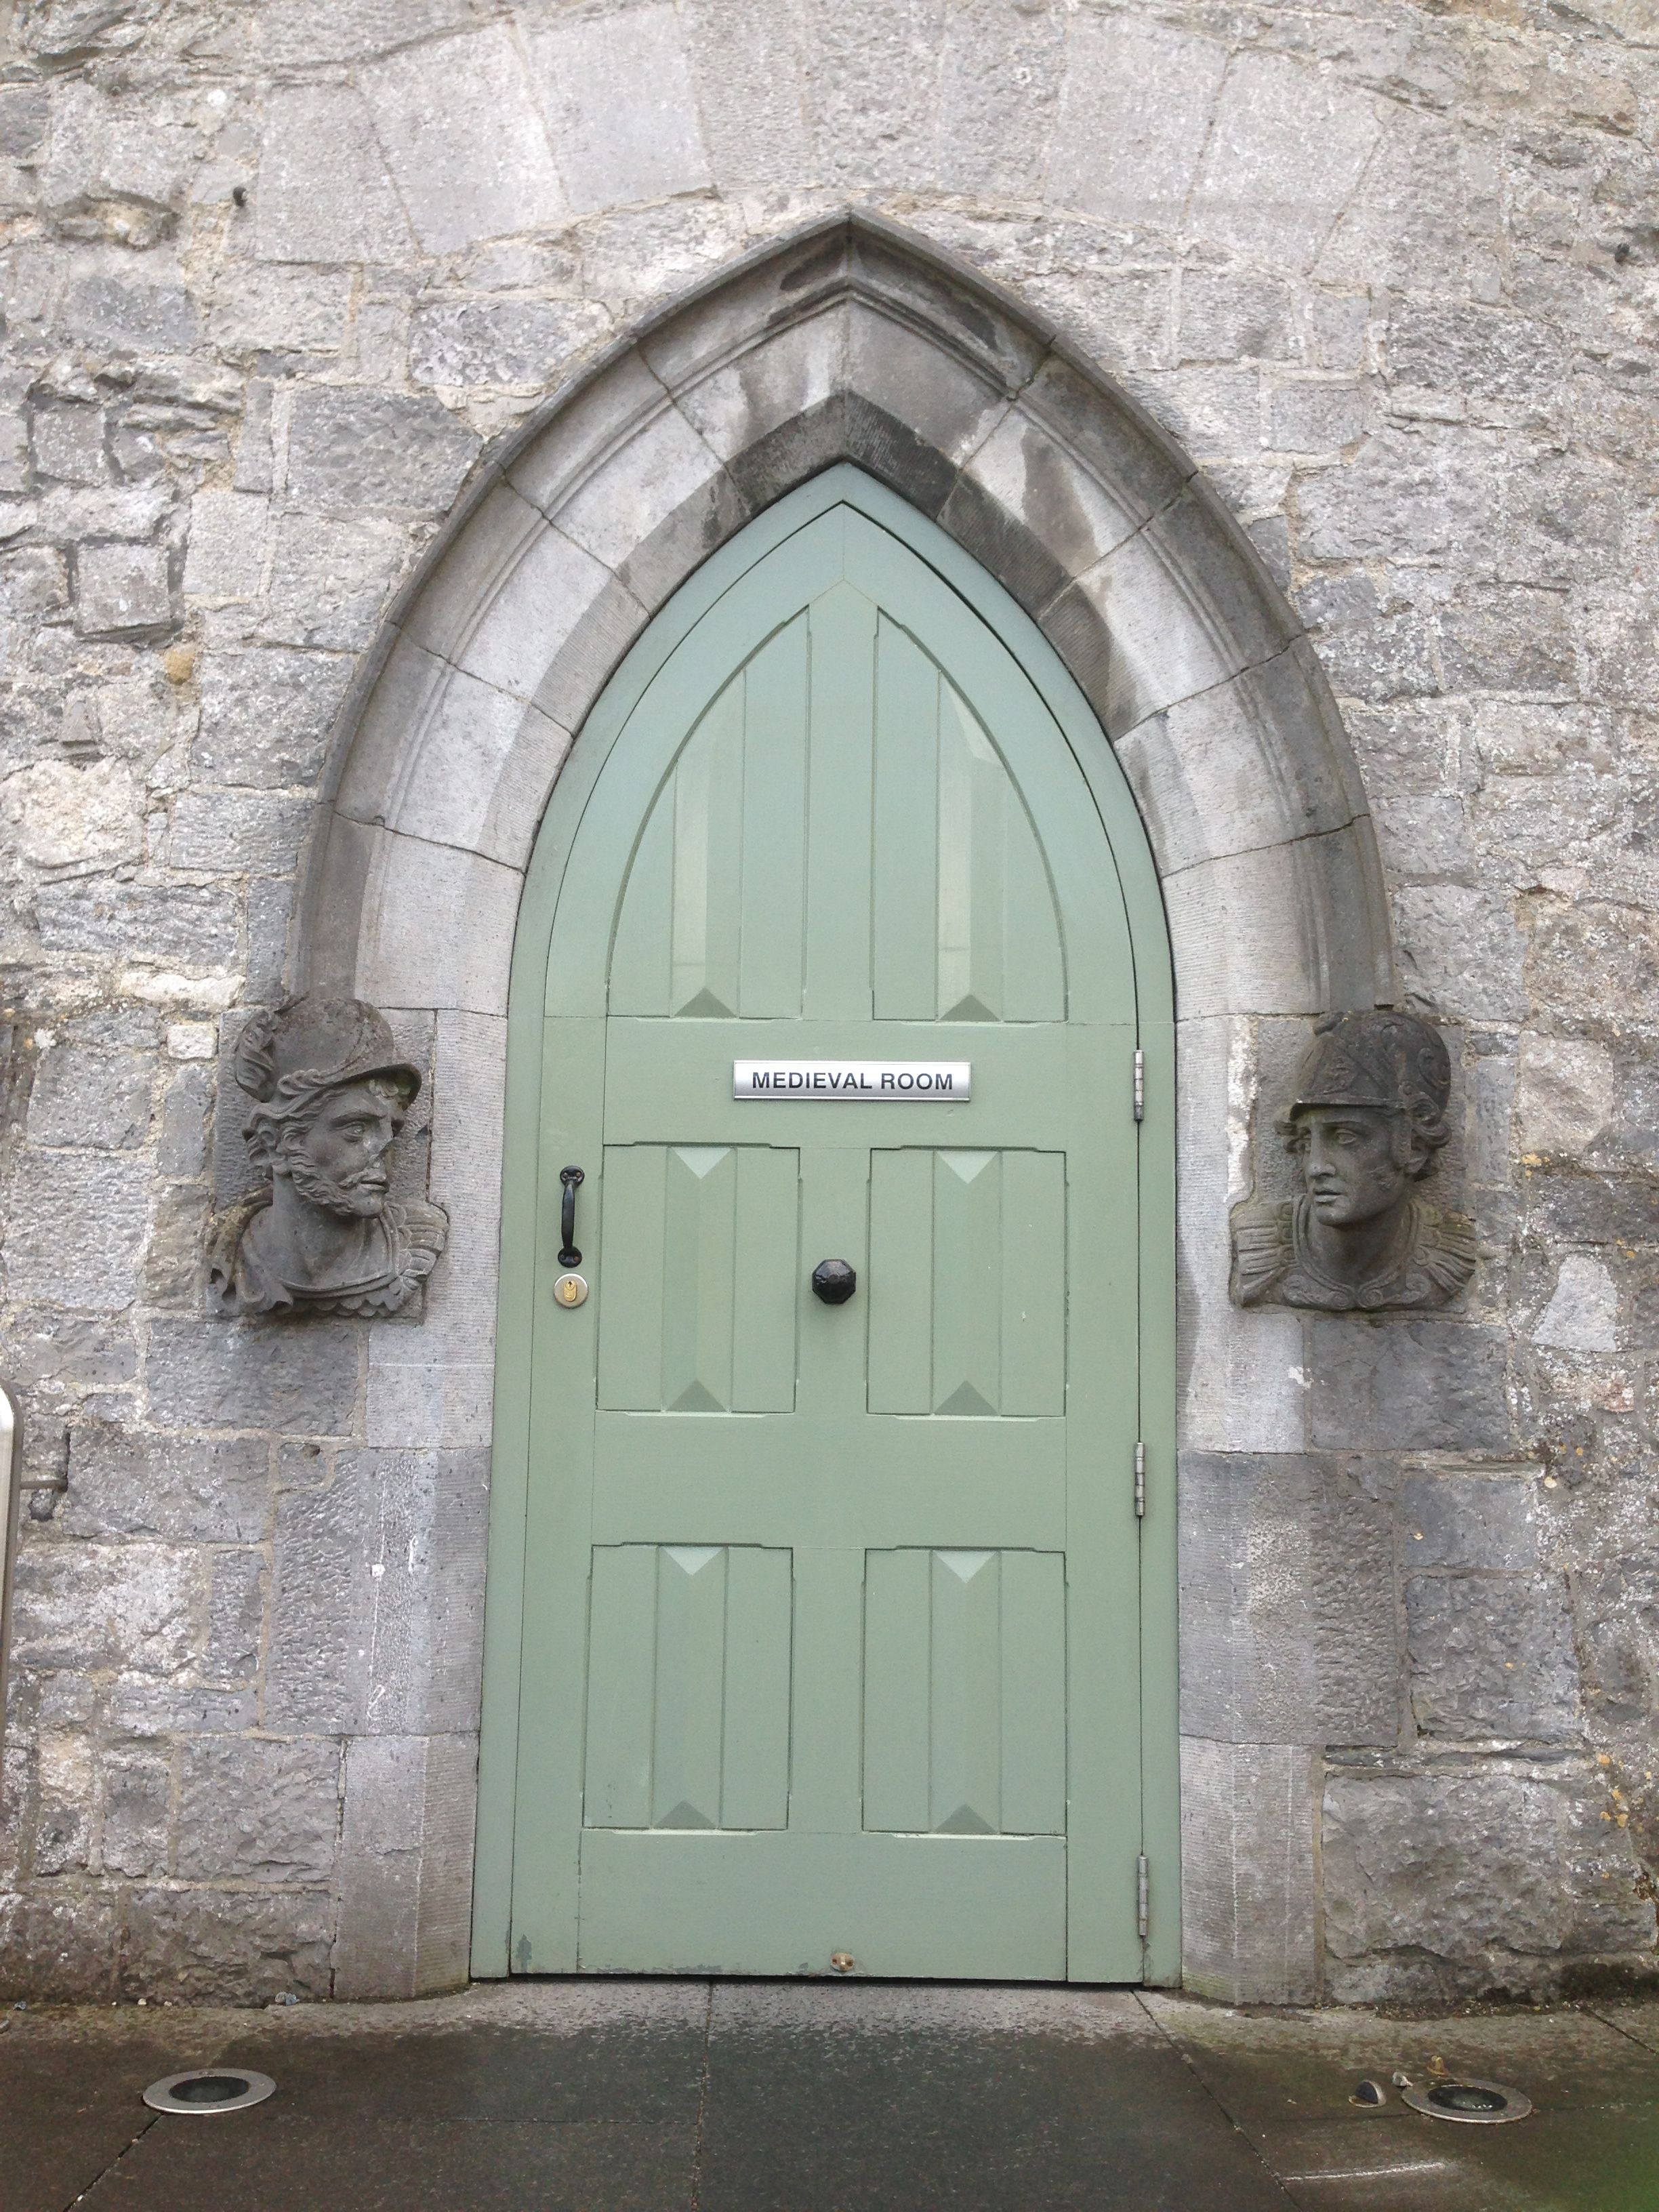 St. Patrick's Decor on Pinterest | Deco Mesh, Wreaths and ...  |Ireland Door Decorations